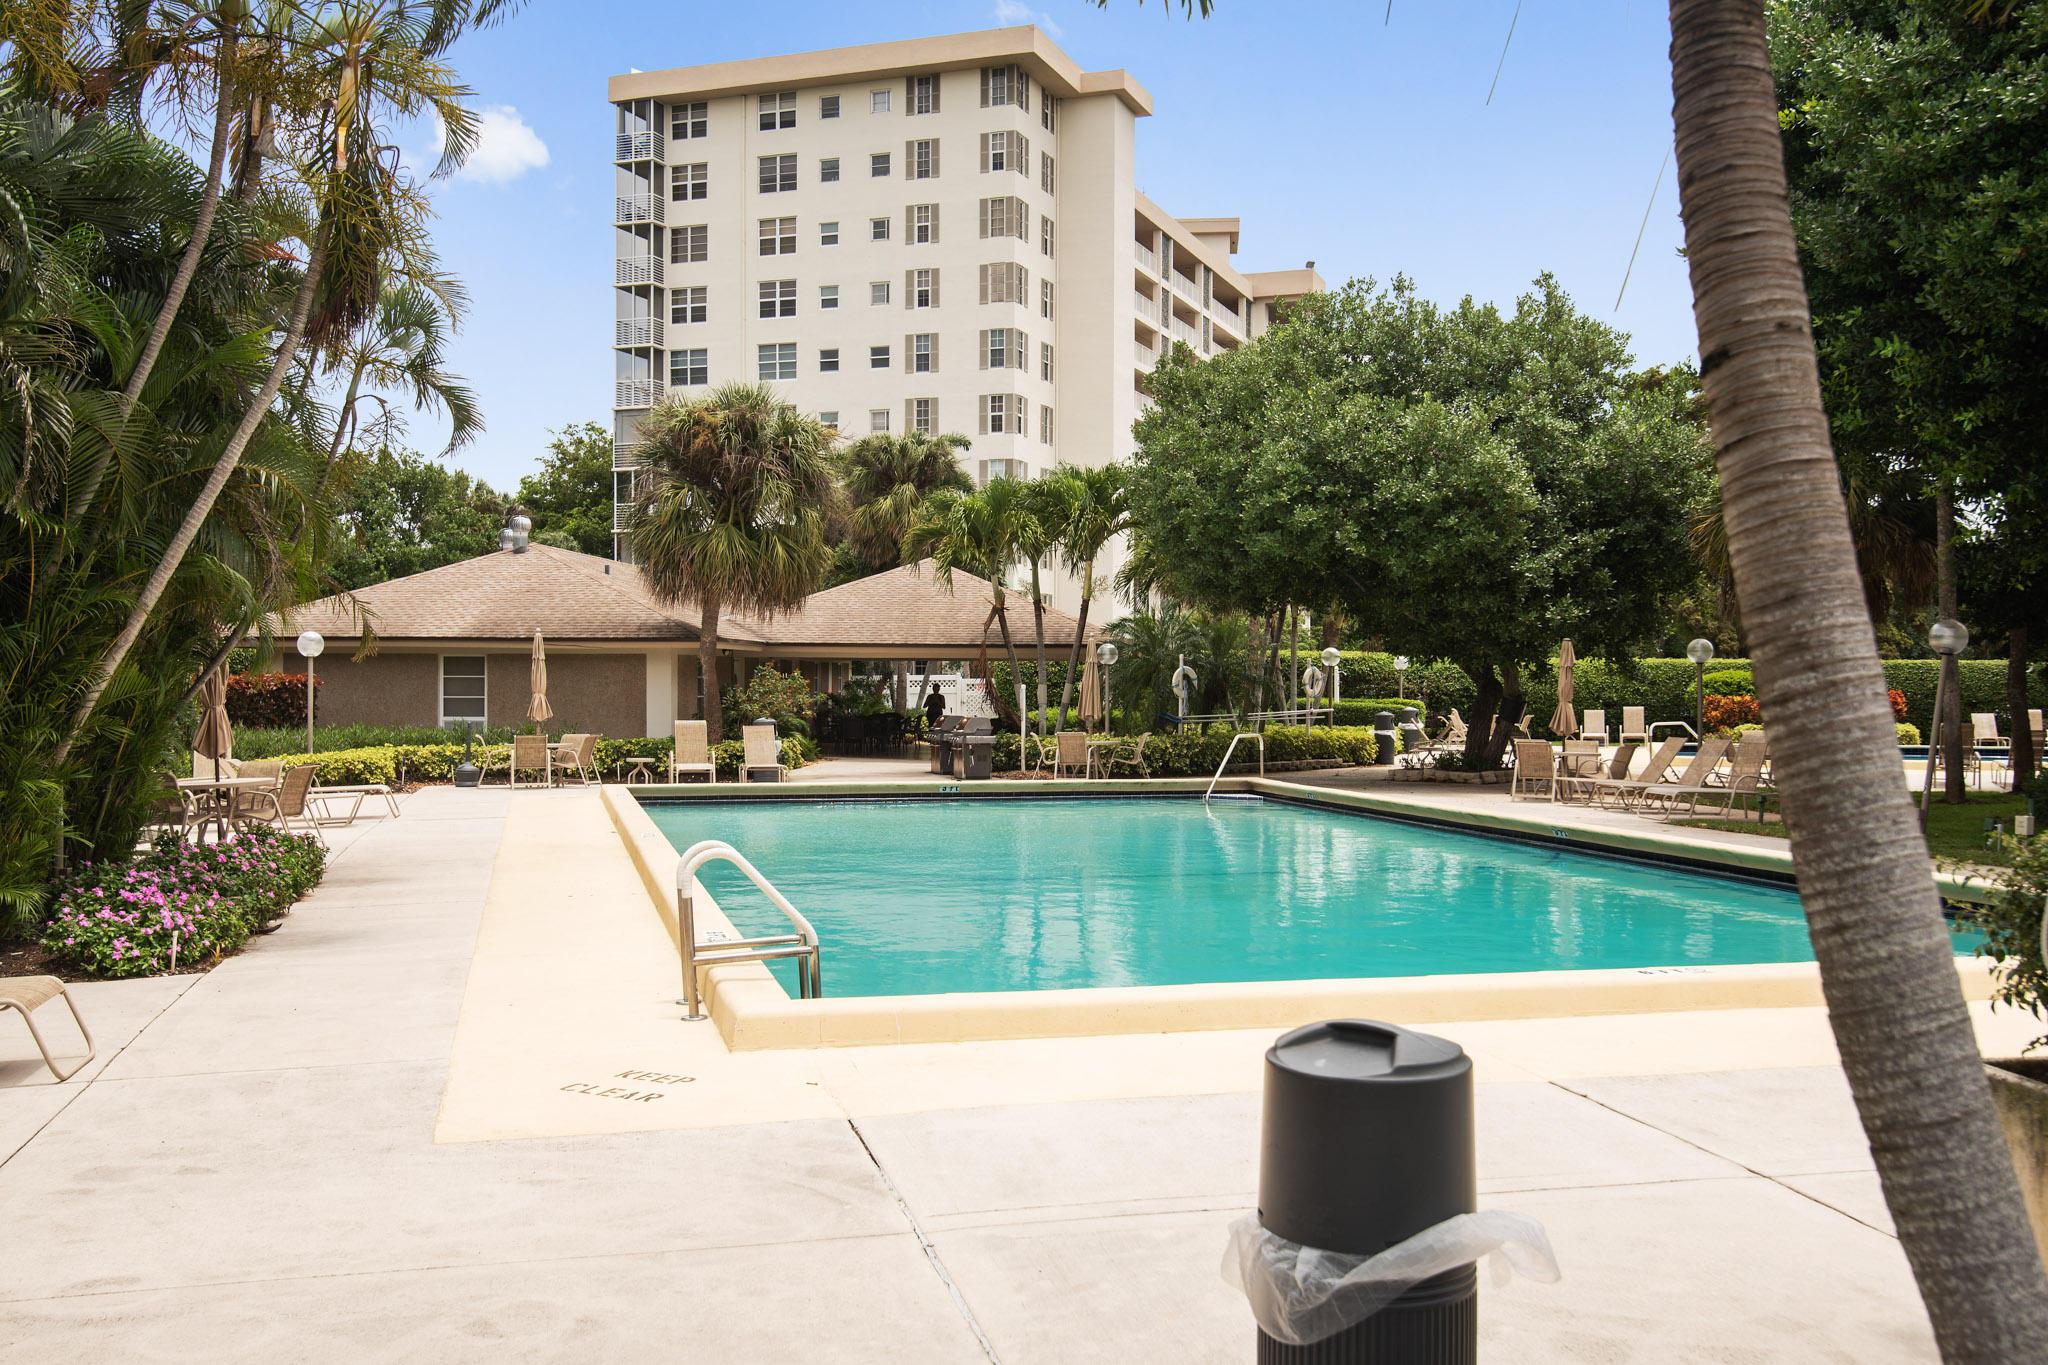 Palm Aire, 3499 Oaks Unit 110, Pompano Beach, Florida 33069